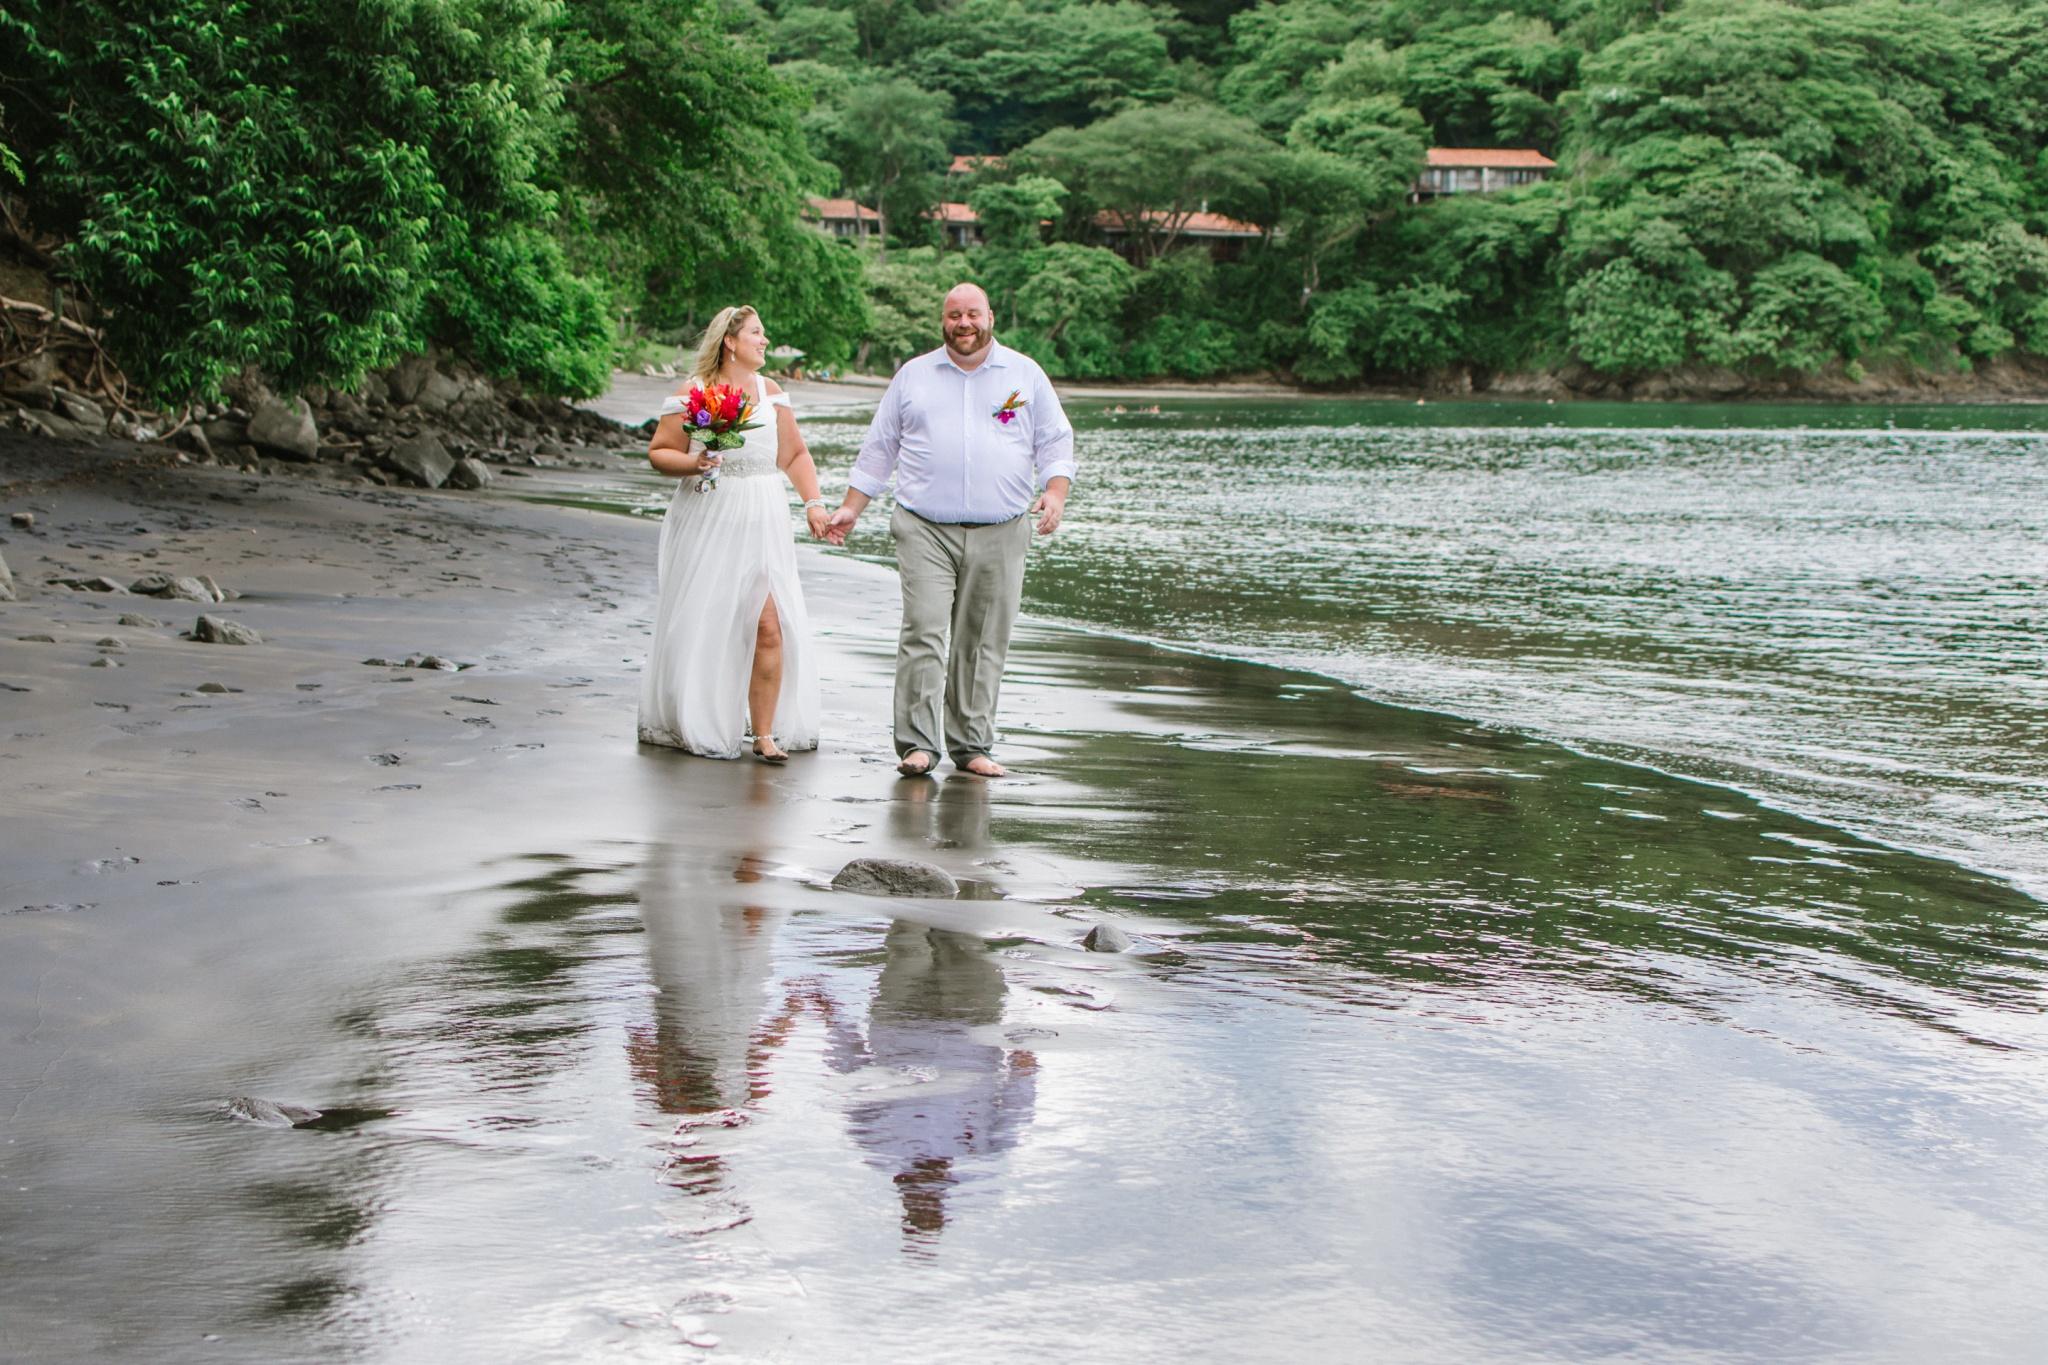 Sandy & Bryson - Elopement in Secrets Papagayo - Guanacaste Costa Rica